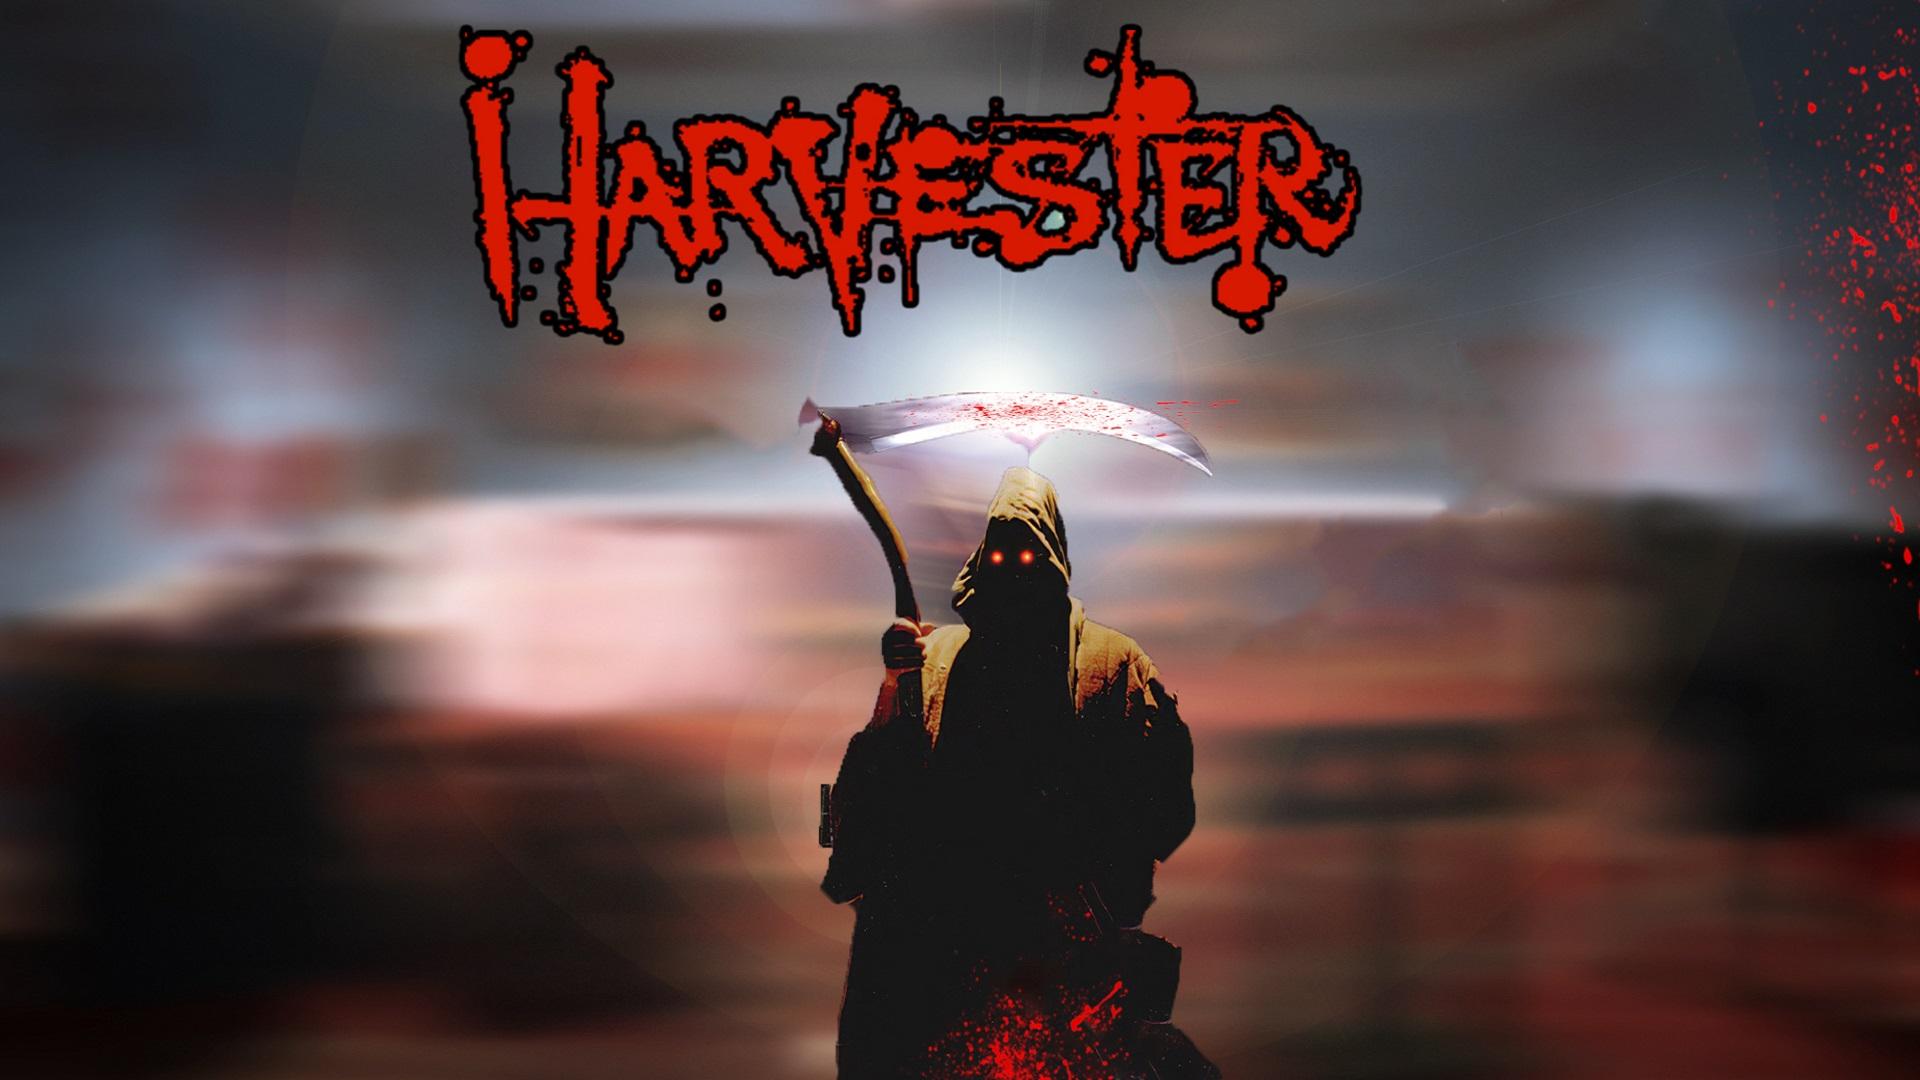 Harvester gra